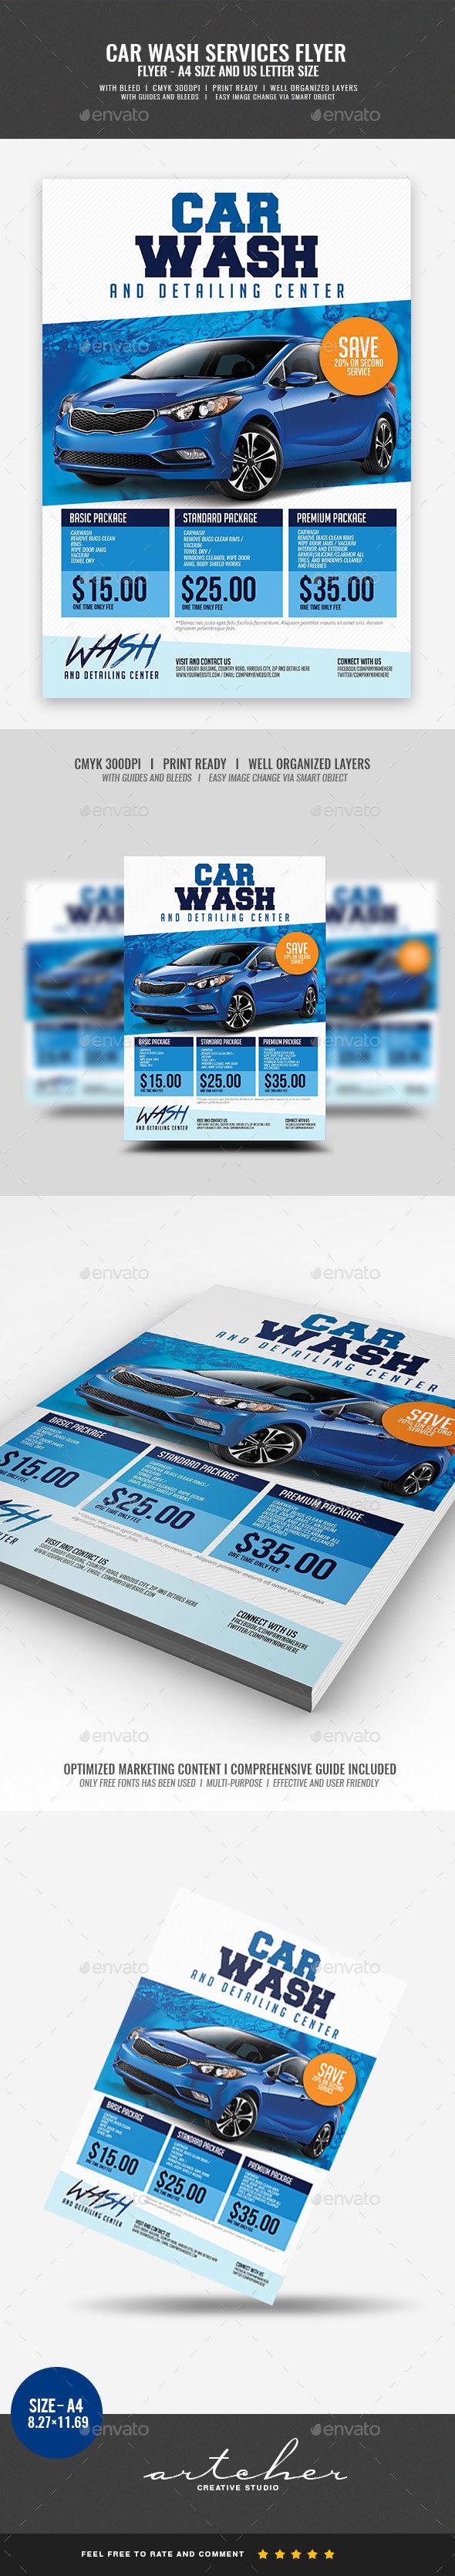 Car Wash Services Flyer - Commerce Flyers